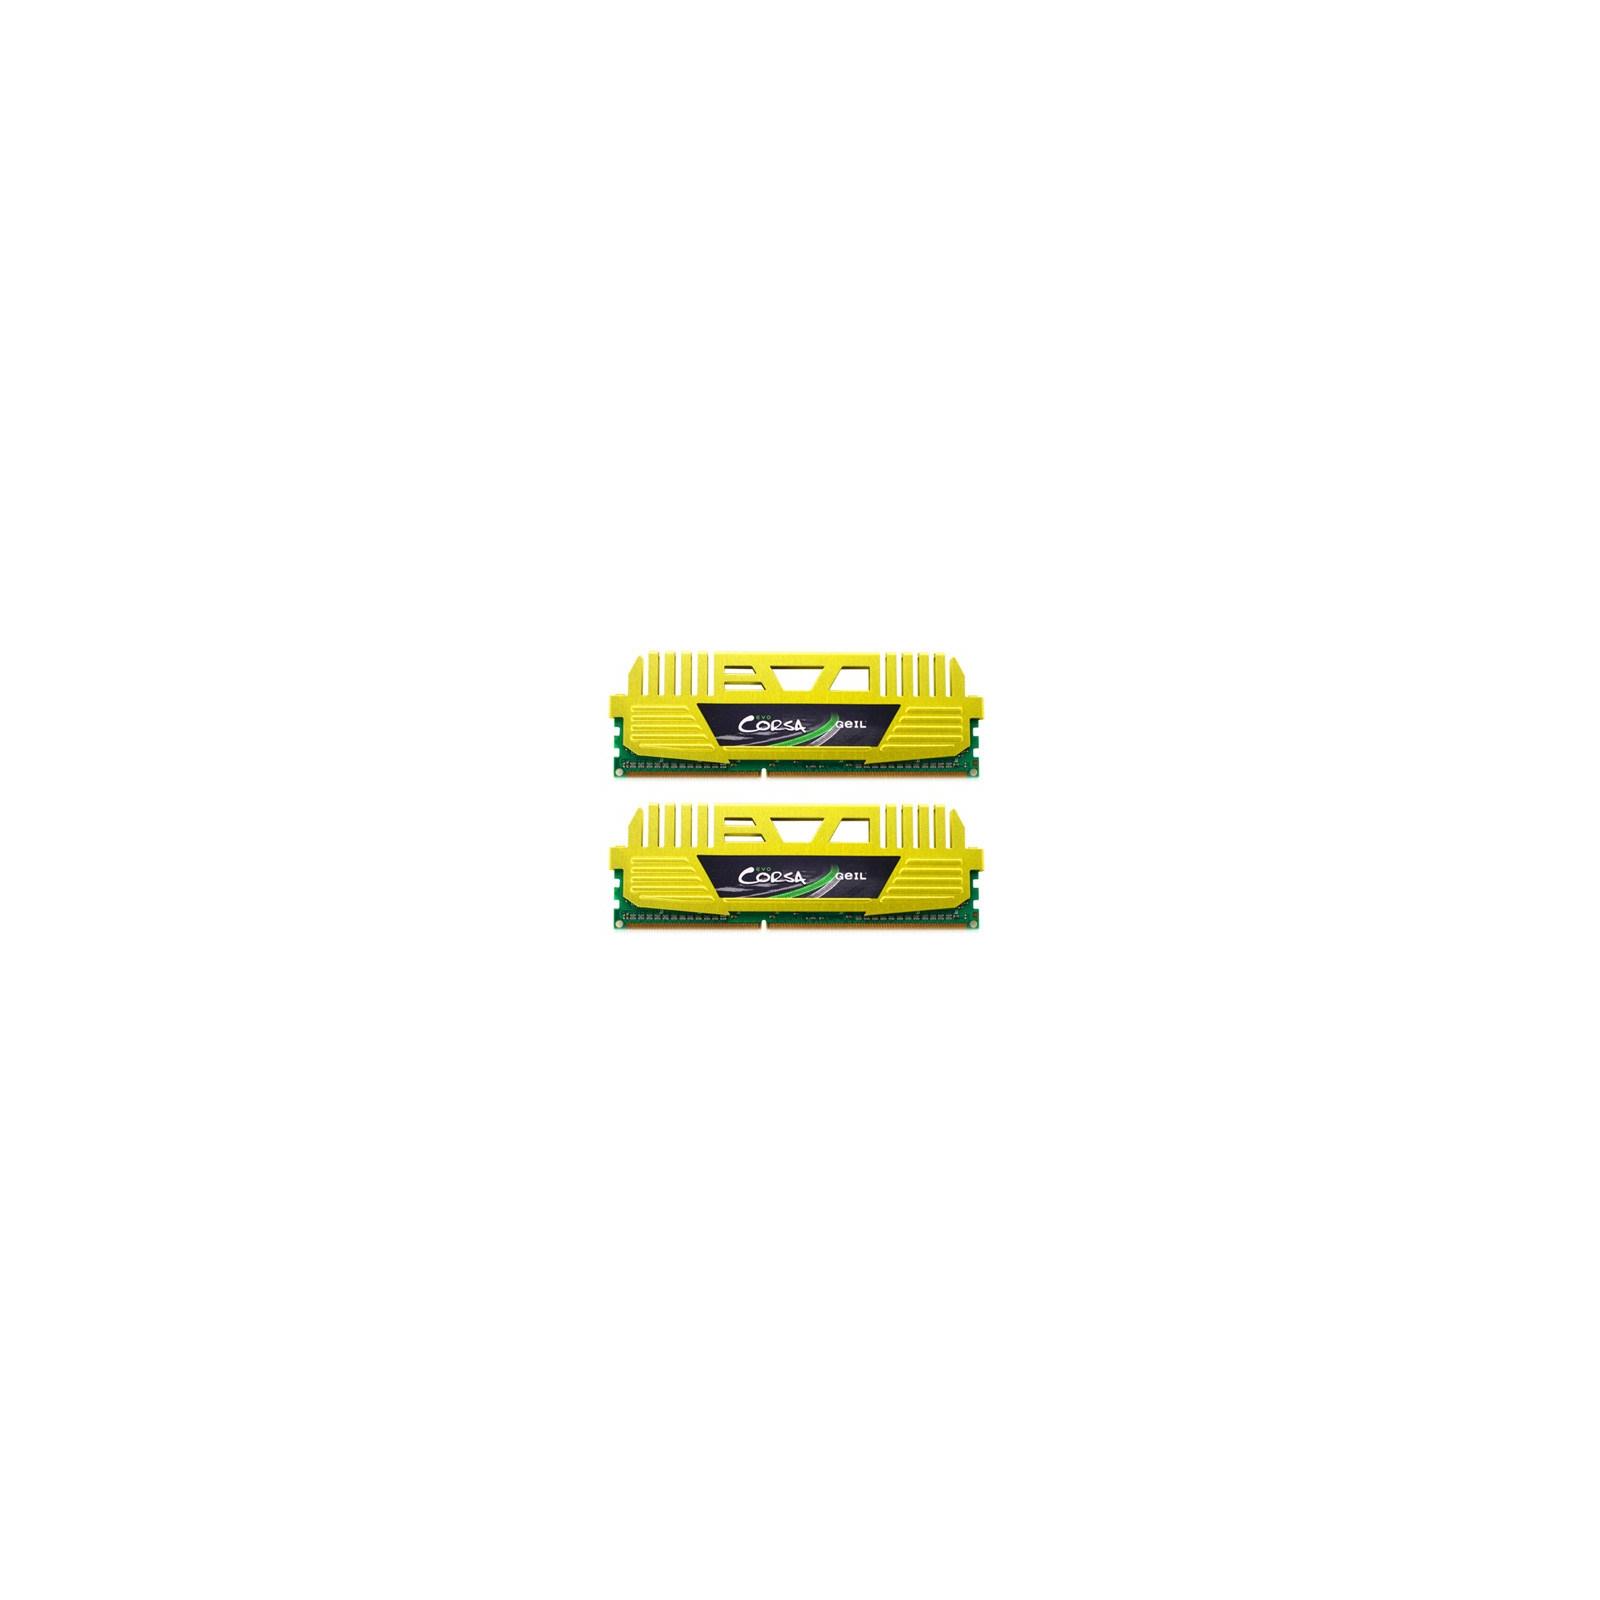 Модуль памяти для компьютера DDR3 4GB (2x2GB) 2133 MHz GEIL (GOC34GB2133C10ADC)